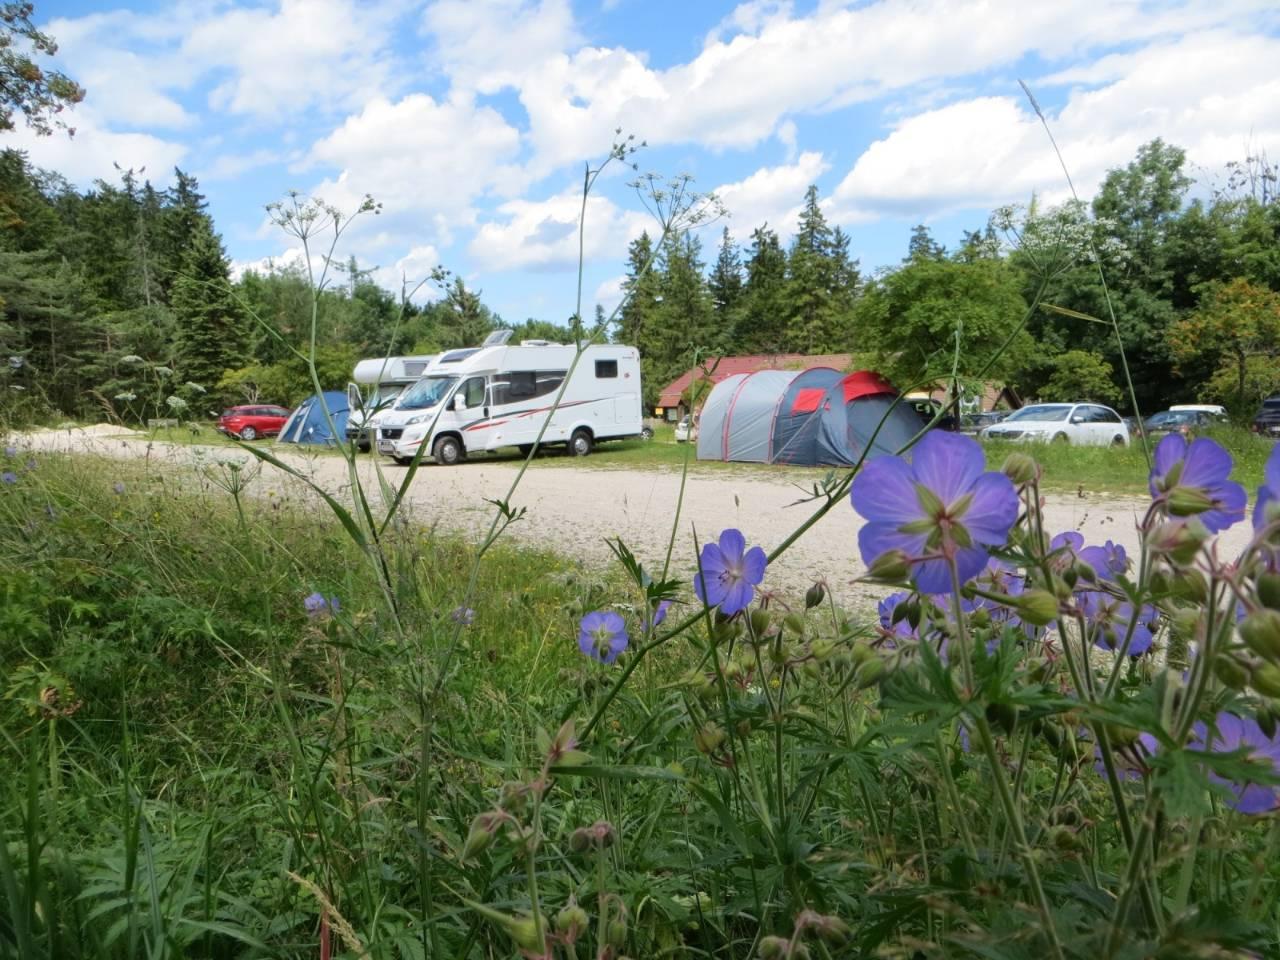 Location: Stellplätze im Naturpark Hohe Wand